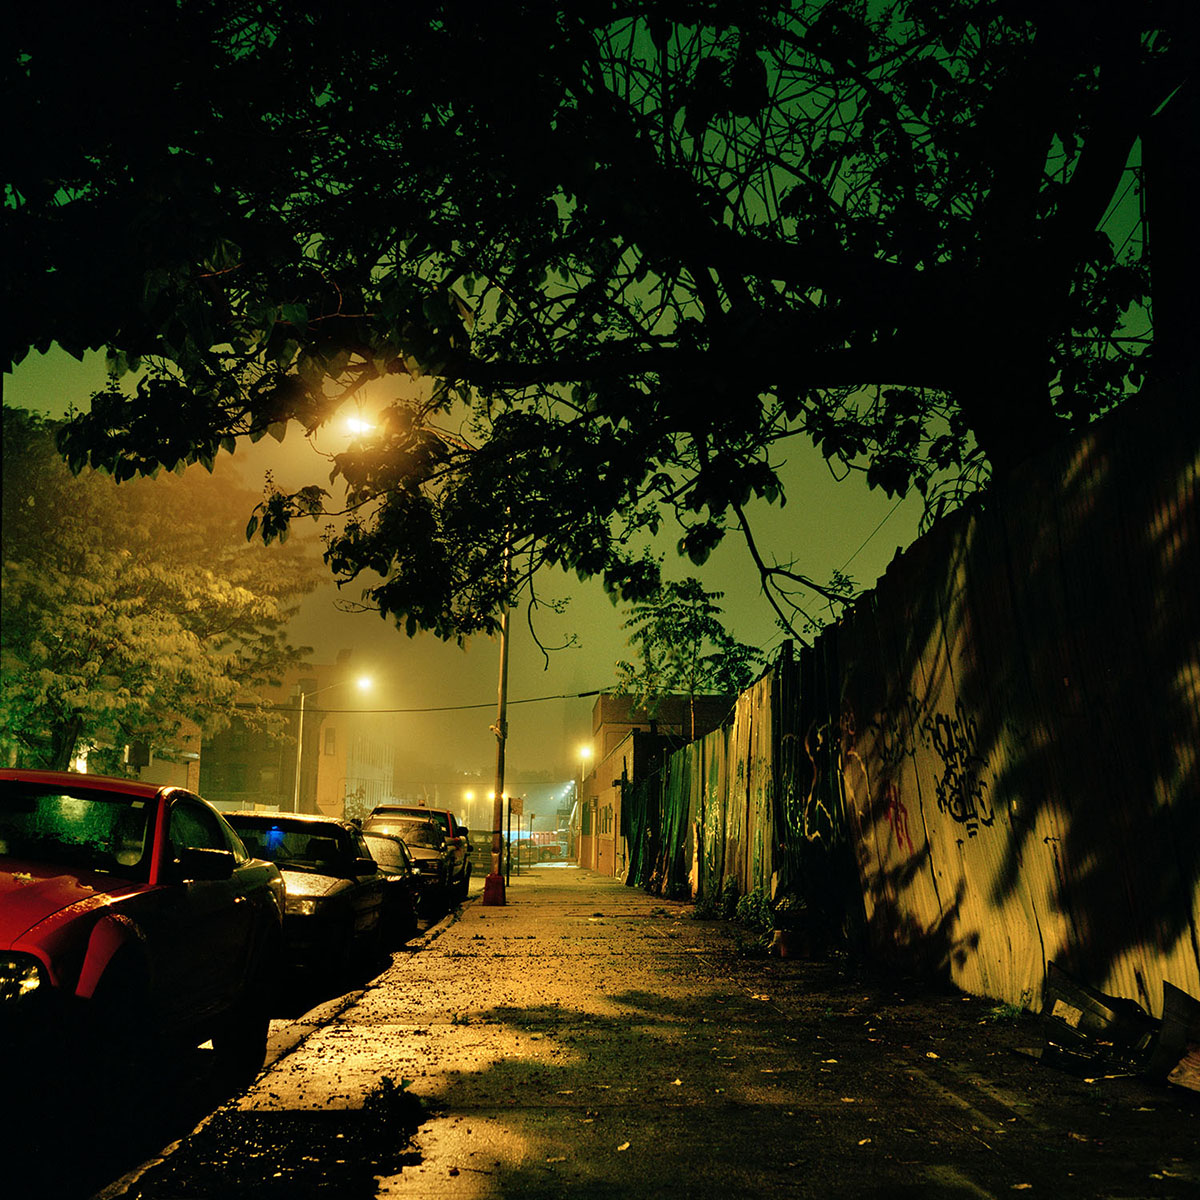 01-Draskoczy-StreetJungle.jpg